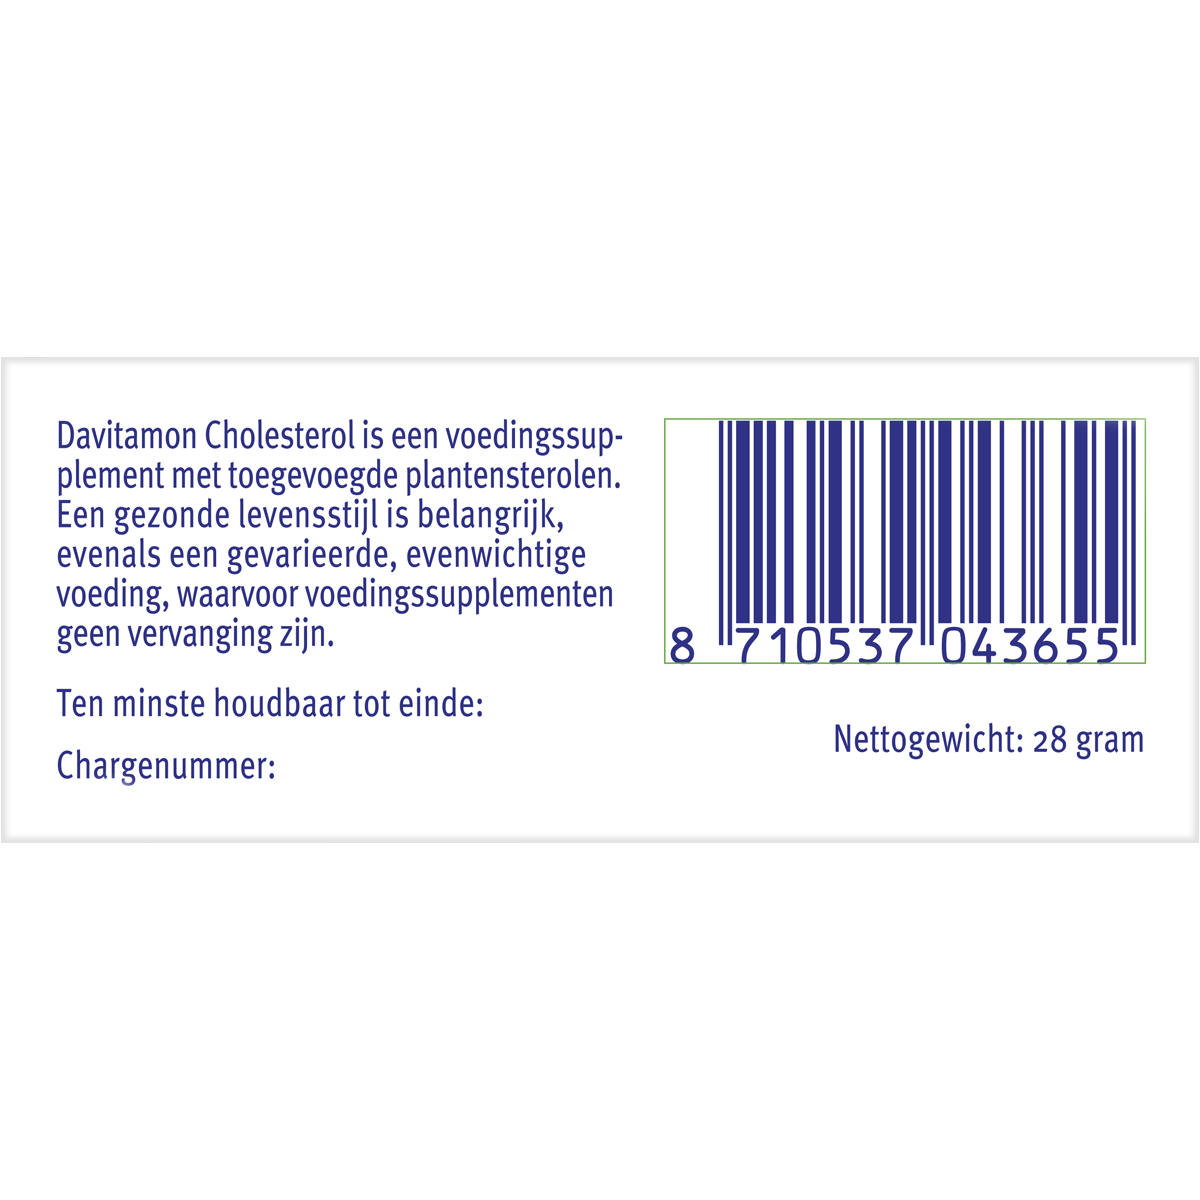 Barcode Davitamon Cholesterol voor volwassenen